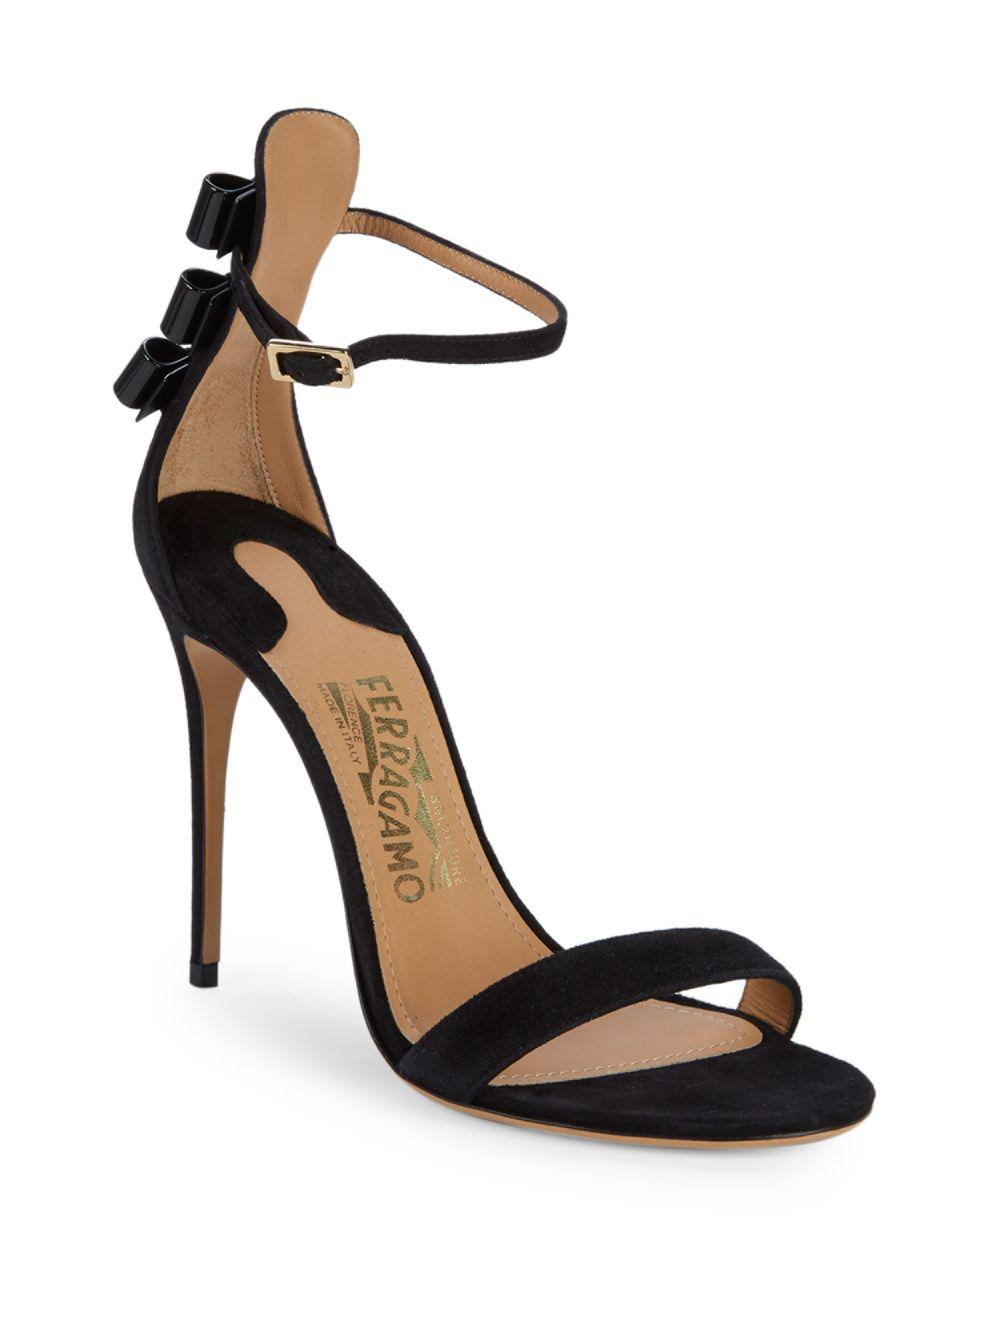 1686626052f7 Lyst - Ferragamo Angie Suede Sandals in Black